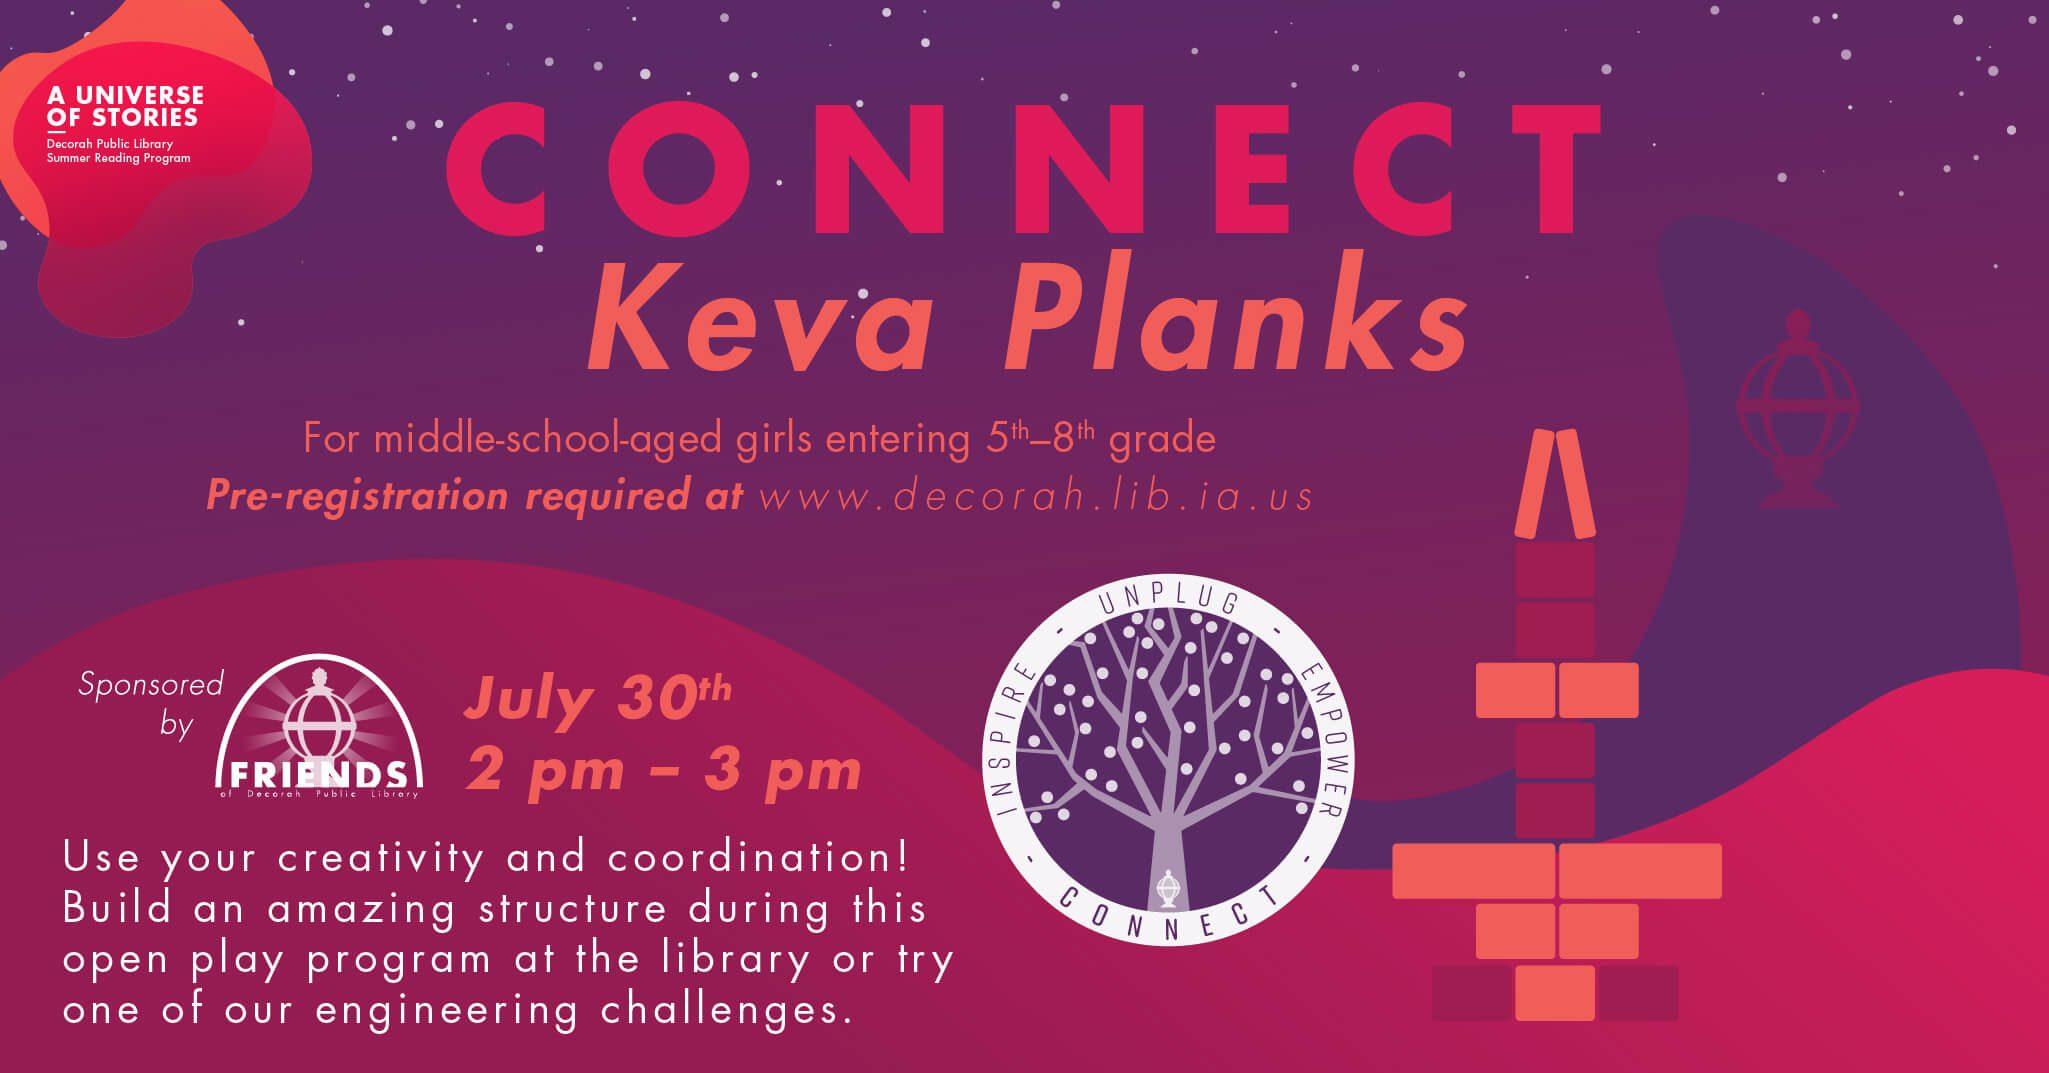 Connect: Keva Planks